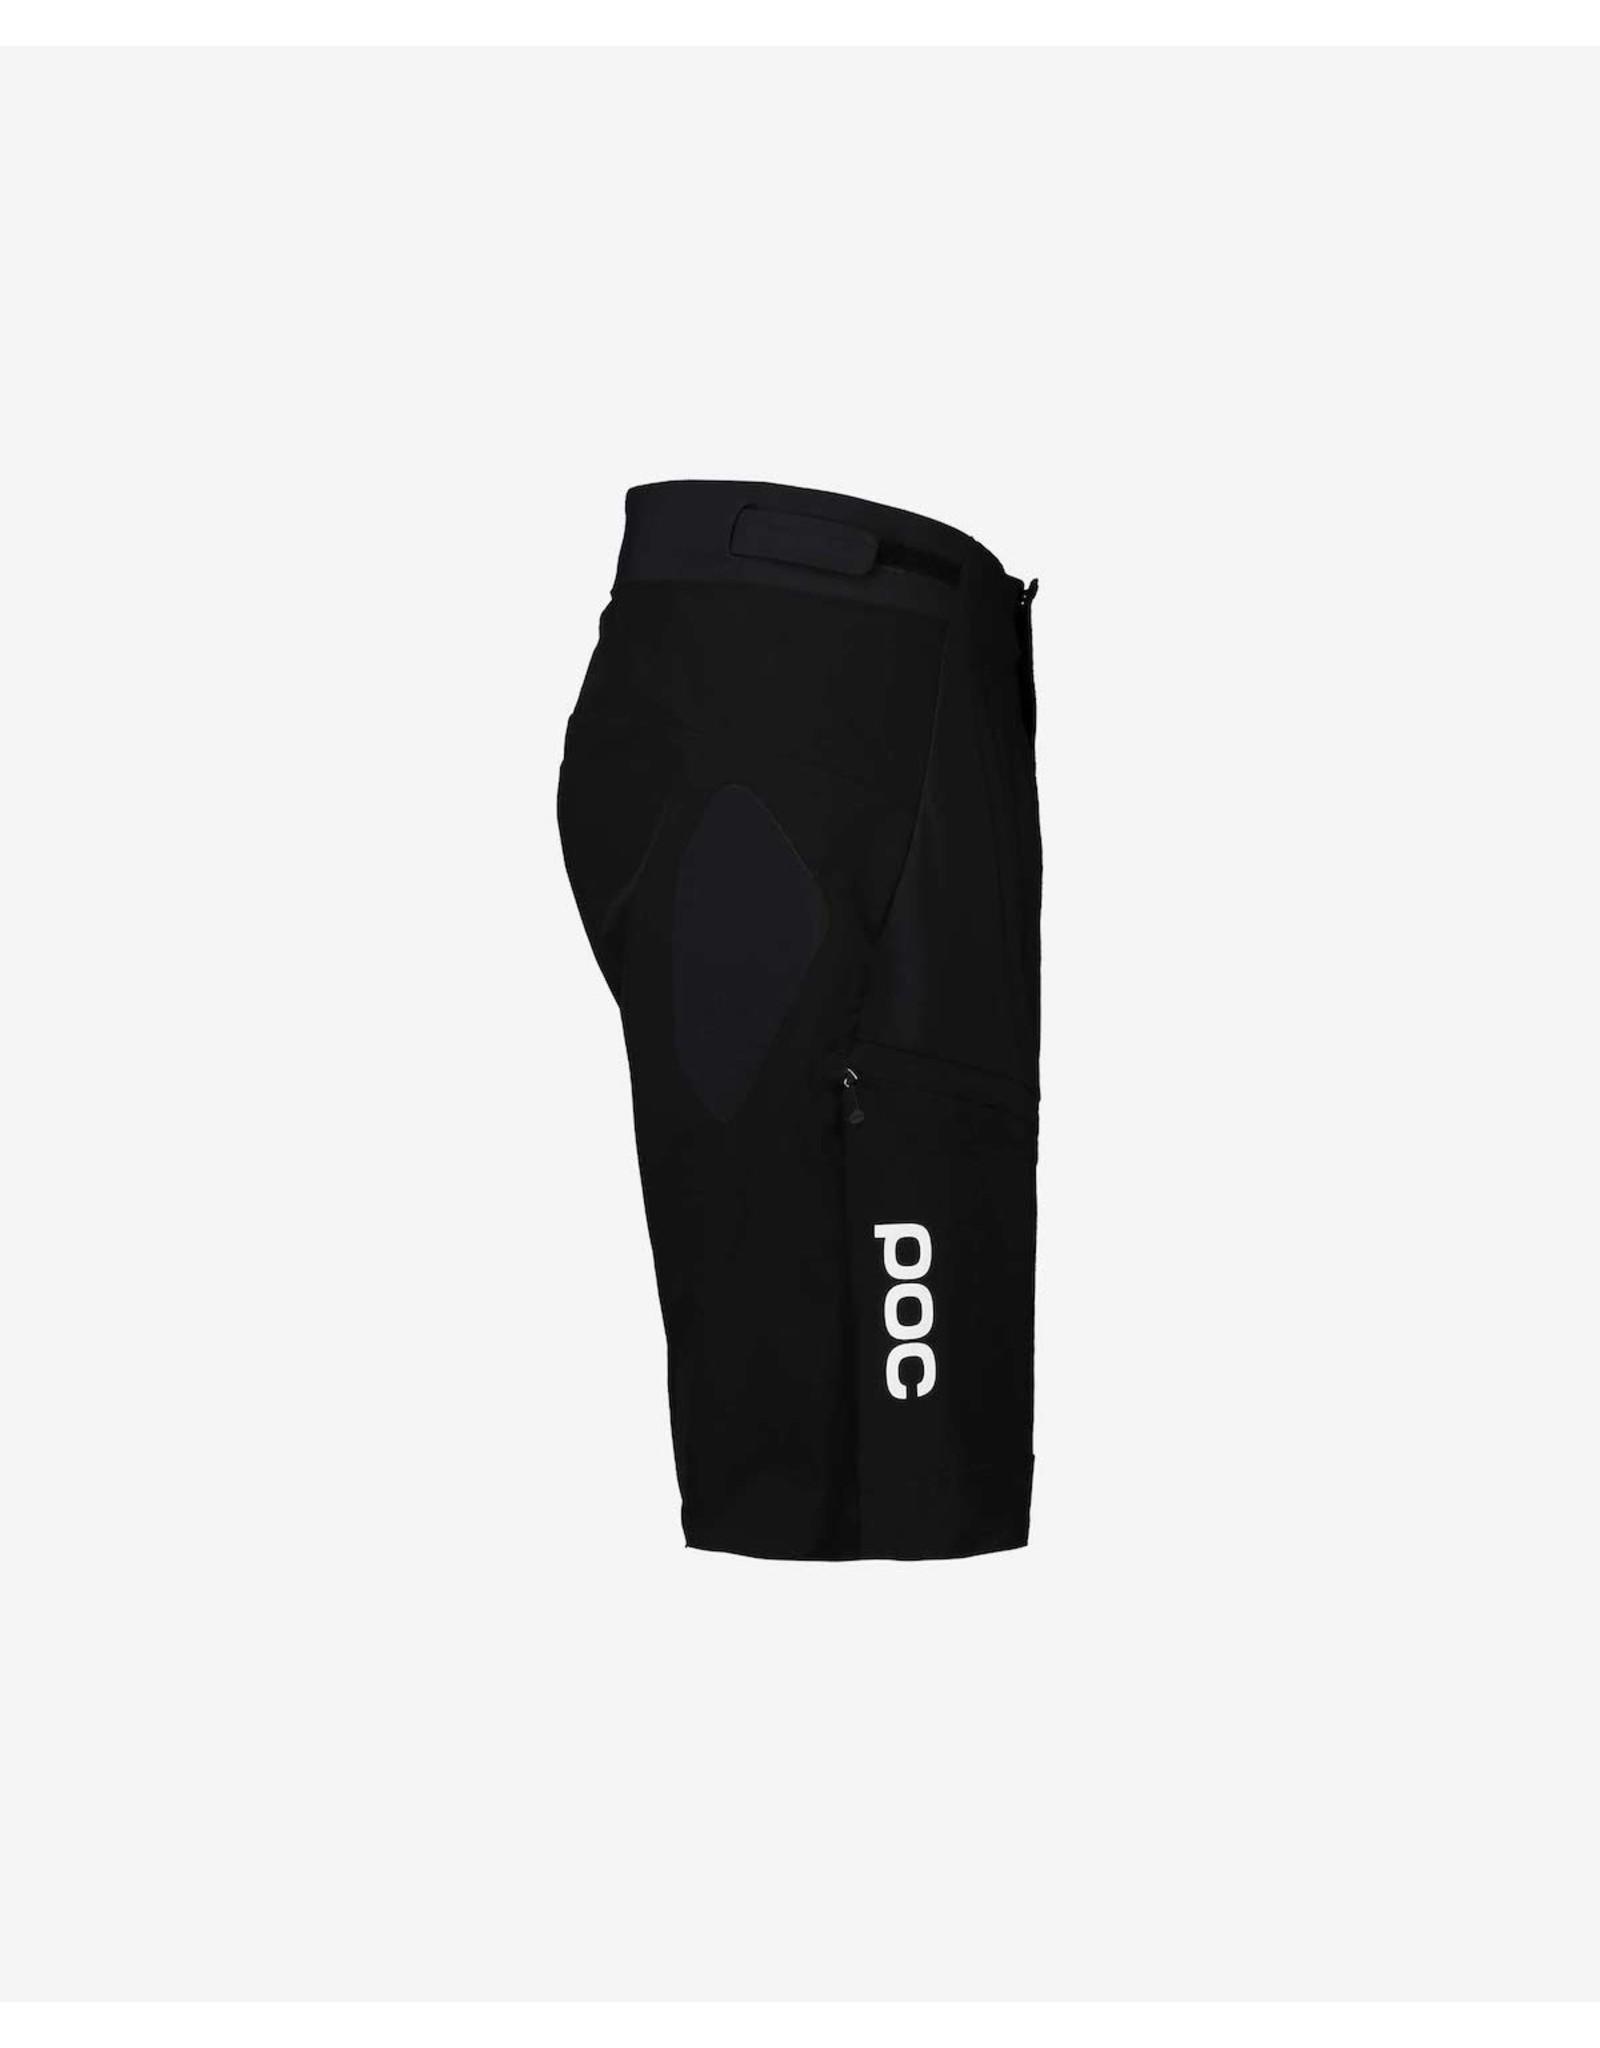 POC POC Resistance Ultra Shorts